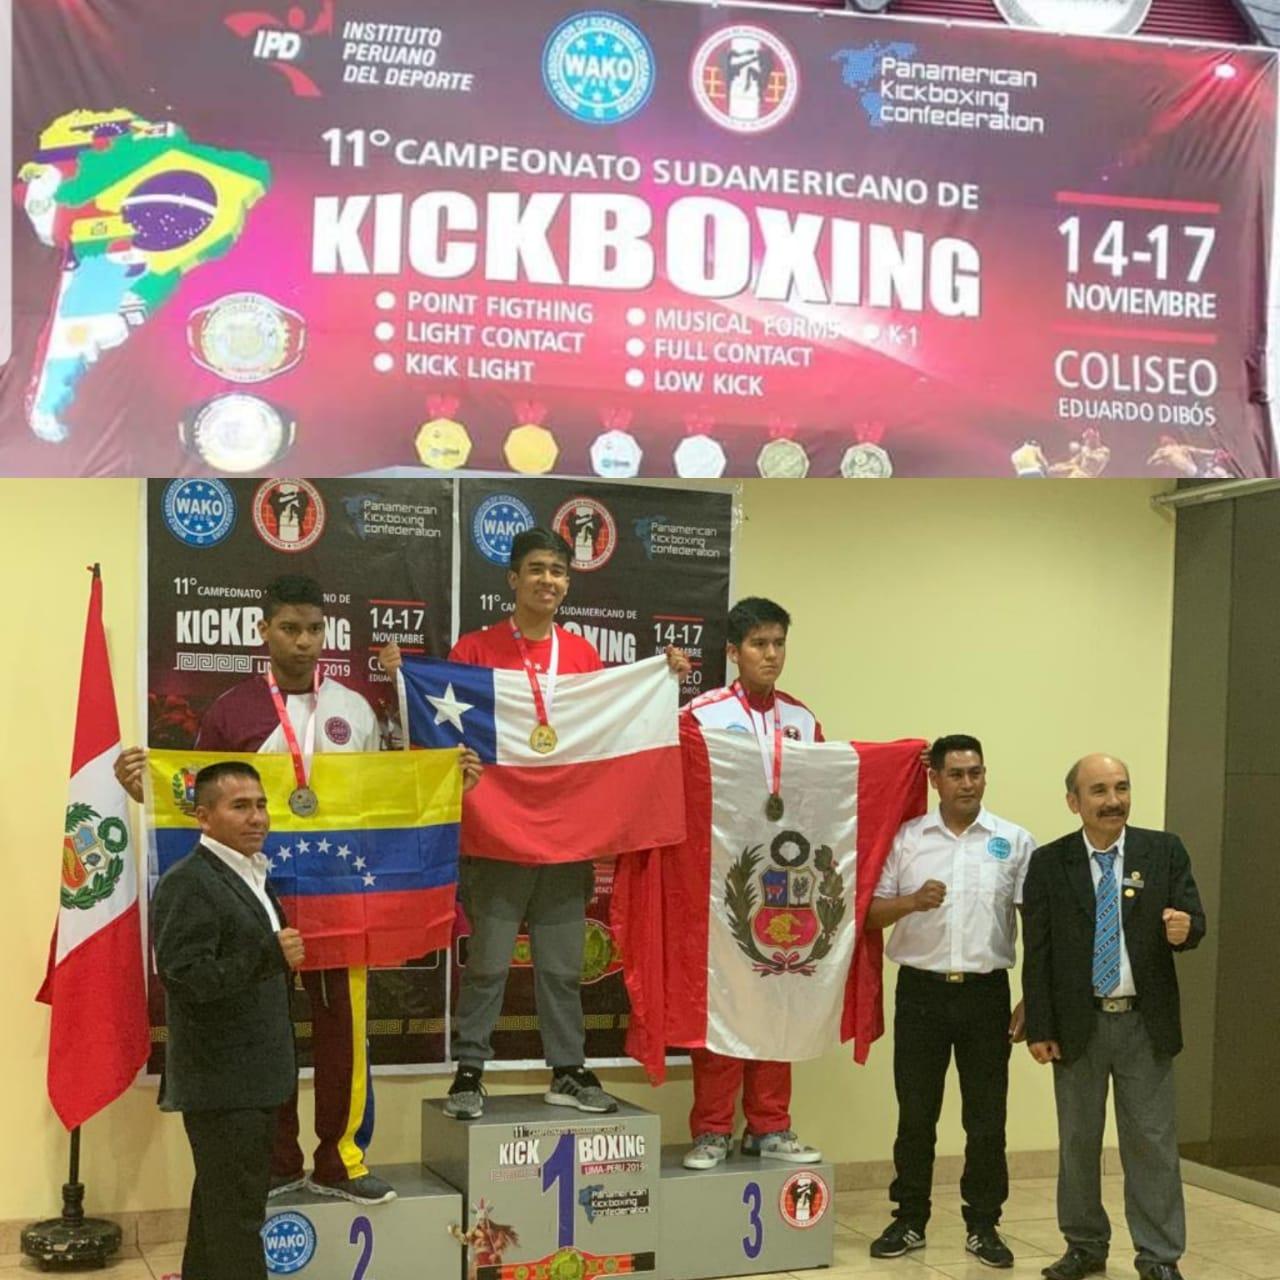 Campeonato Sudamericano de Kickboxing